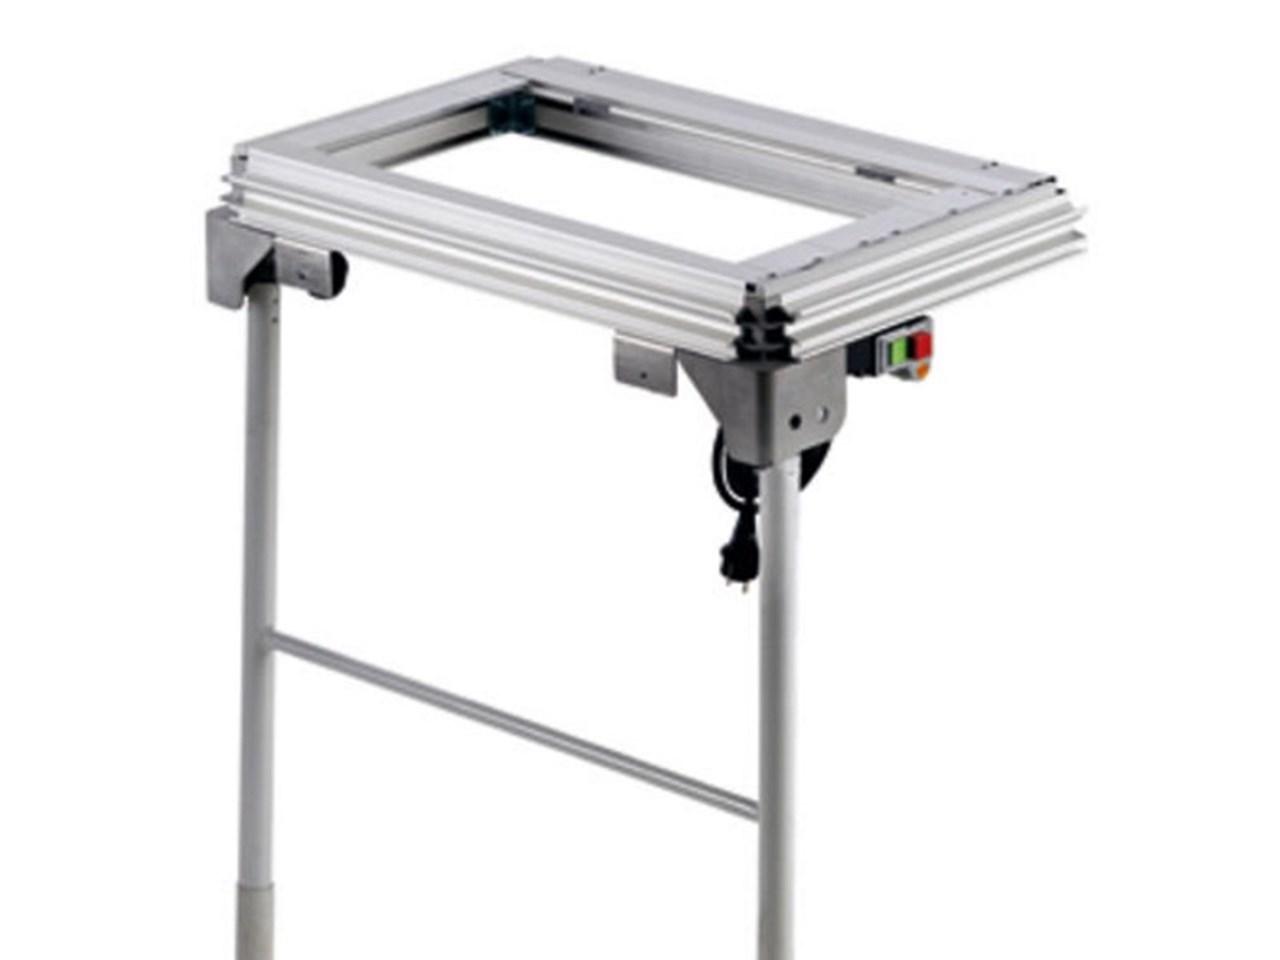 festool mft 3 vl gb 240v multifunction table mft 3 extension. Black Bedroom Furniture Sets. Home Design Ideas